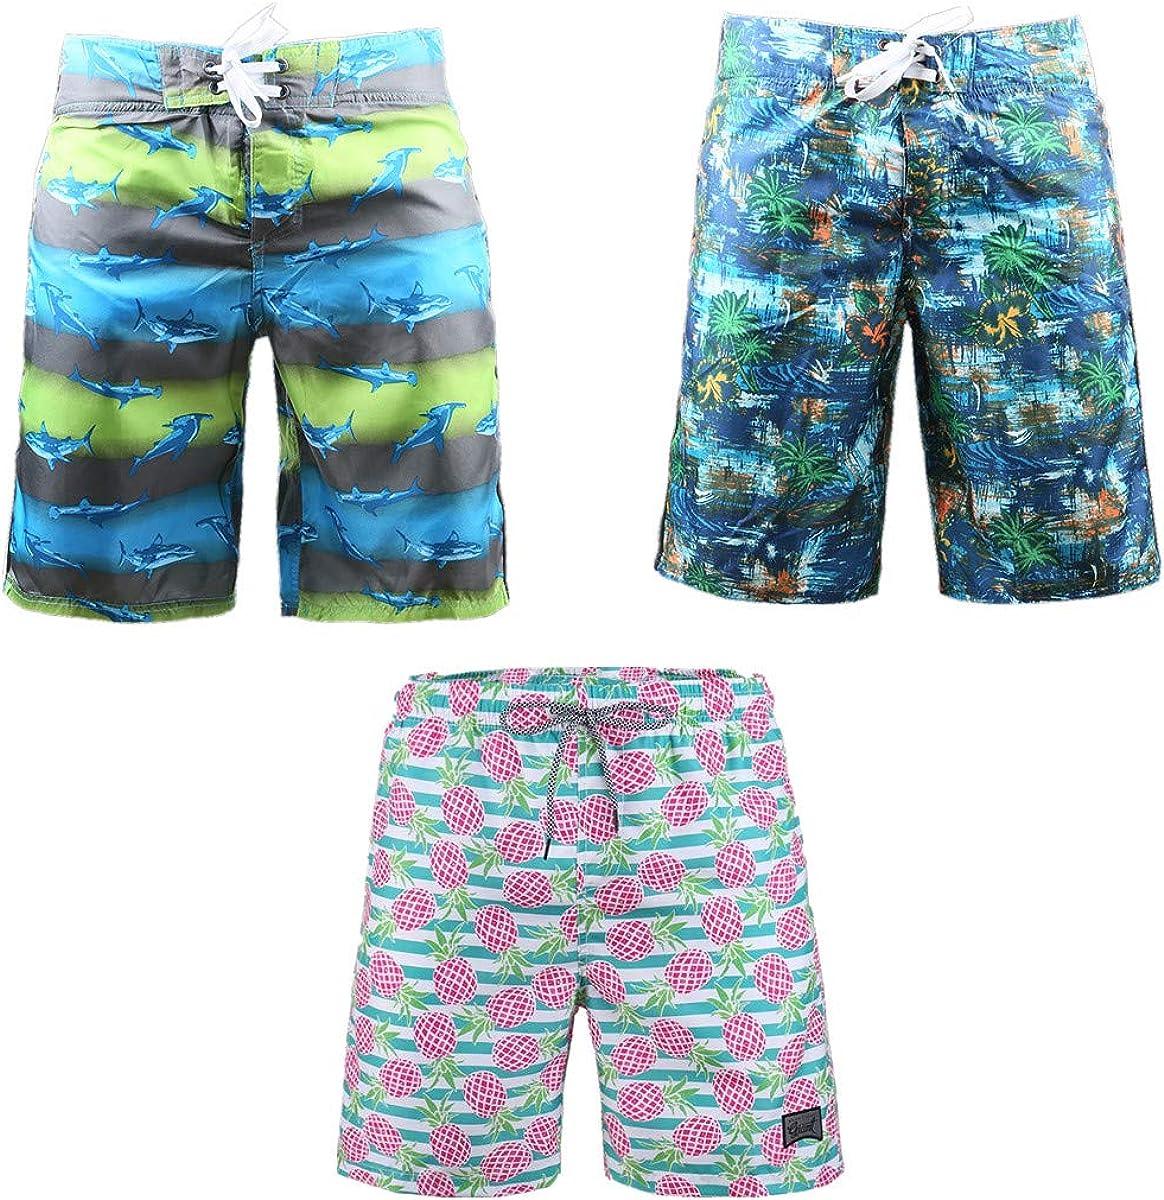 3-Pack Men's Board Shorts Elastic Waist Vacation Beach Swimming Soft Comfy Waterproof Swim Pants